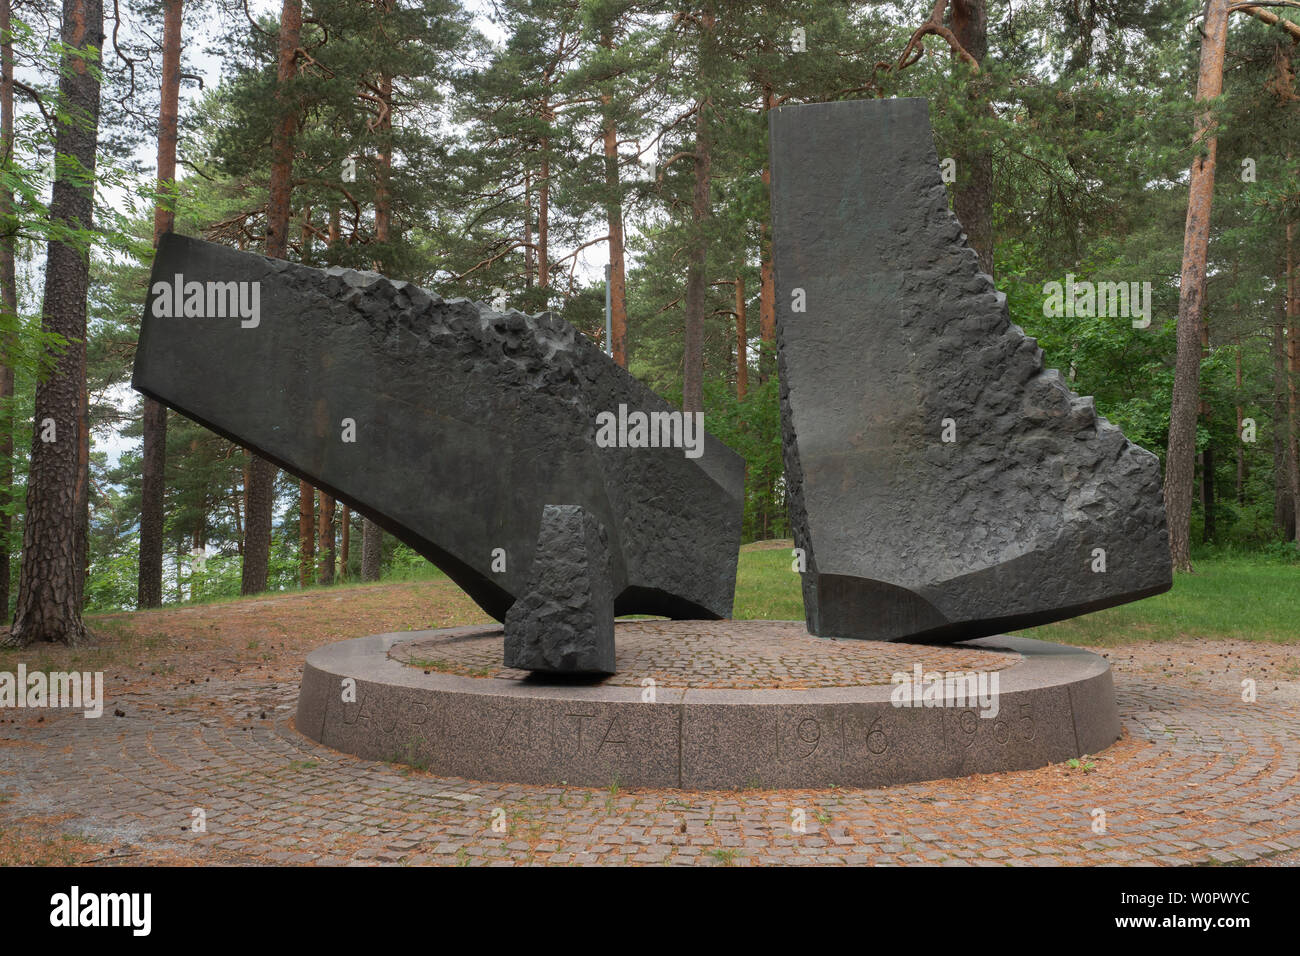 Monument of the Poet Lauri Viita on Pispala Ridge in Tampere Finland - Stock Image